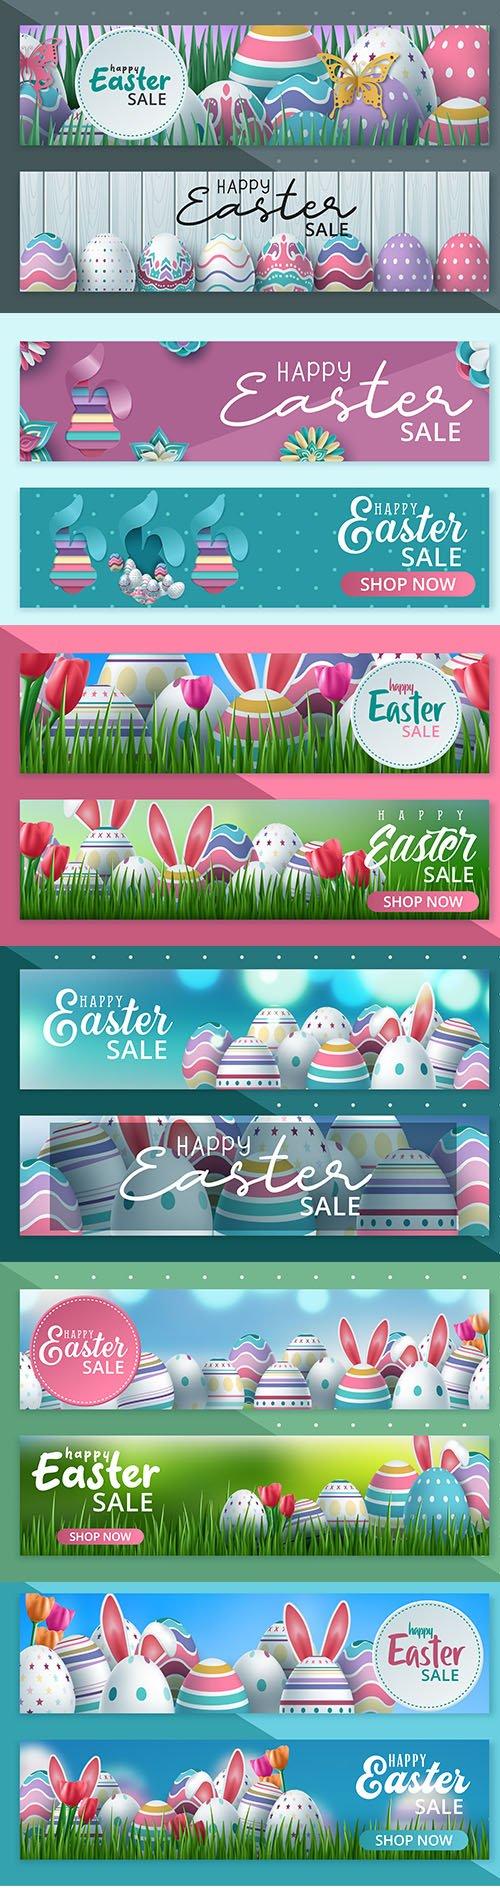 Happy Easter Sale Banner Vector Set